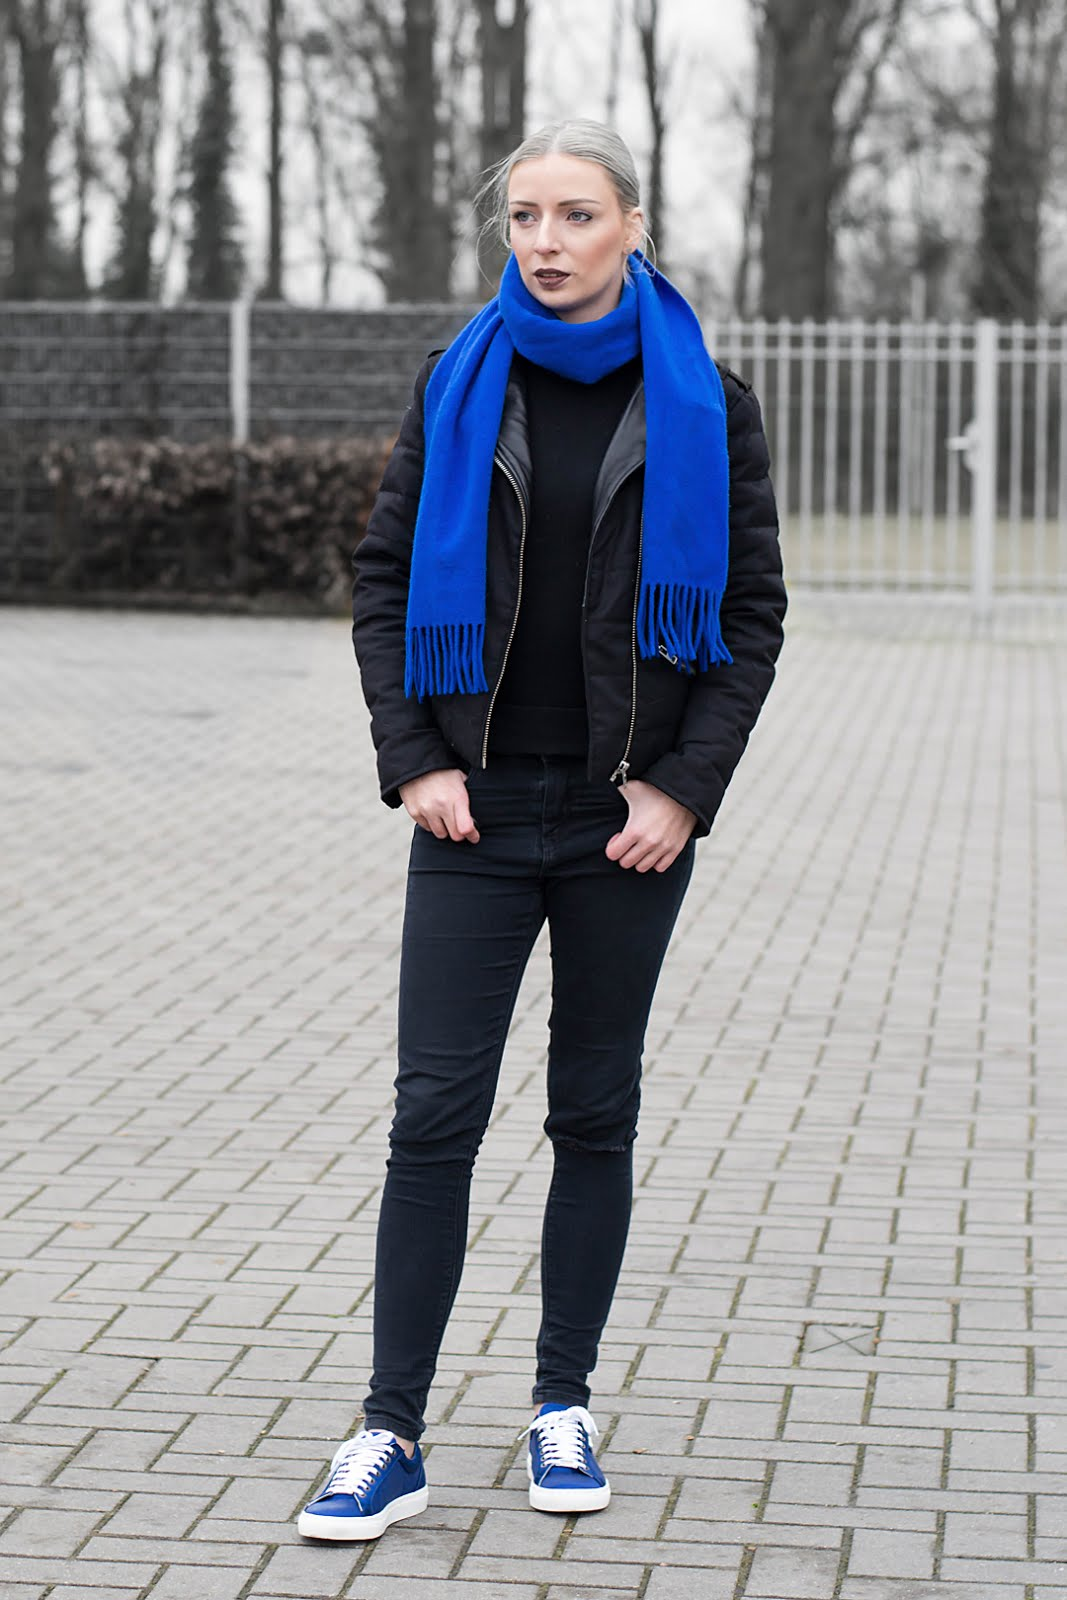 Black Outfit, cobalt blue accessoiries. Wearing karl lagerfeld sneakers and the kooples jacket